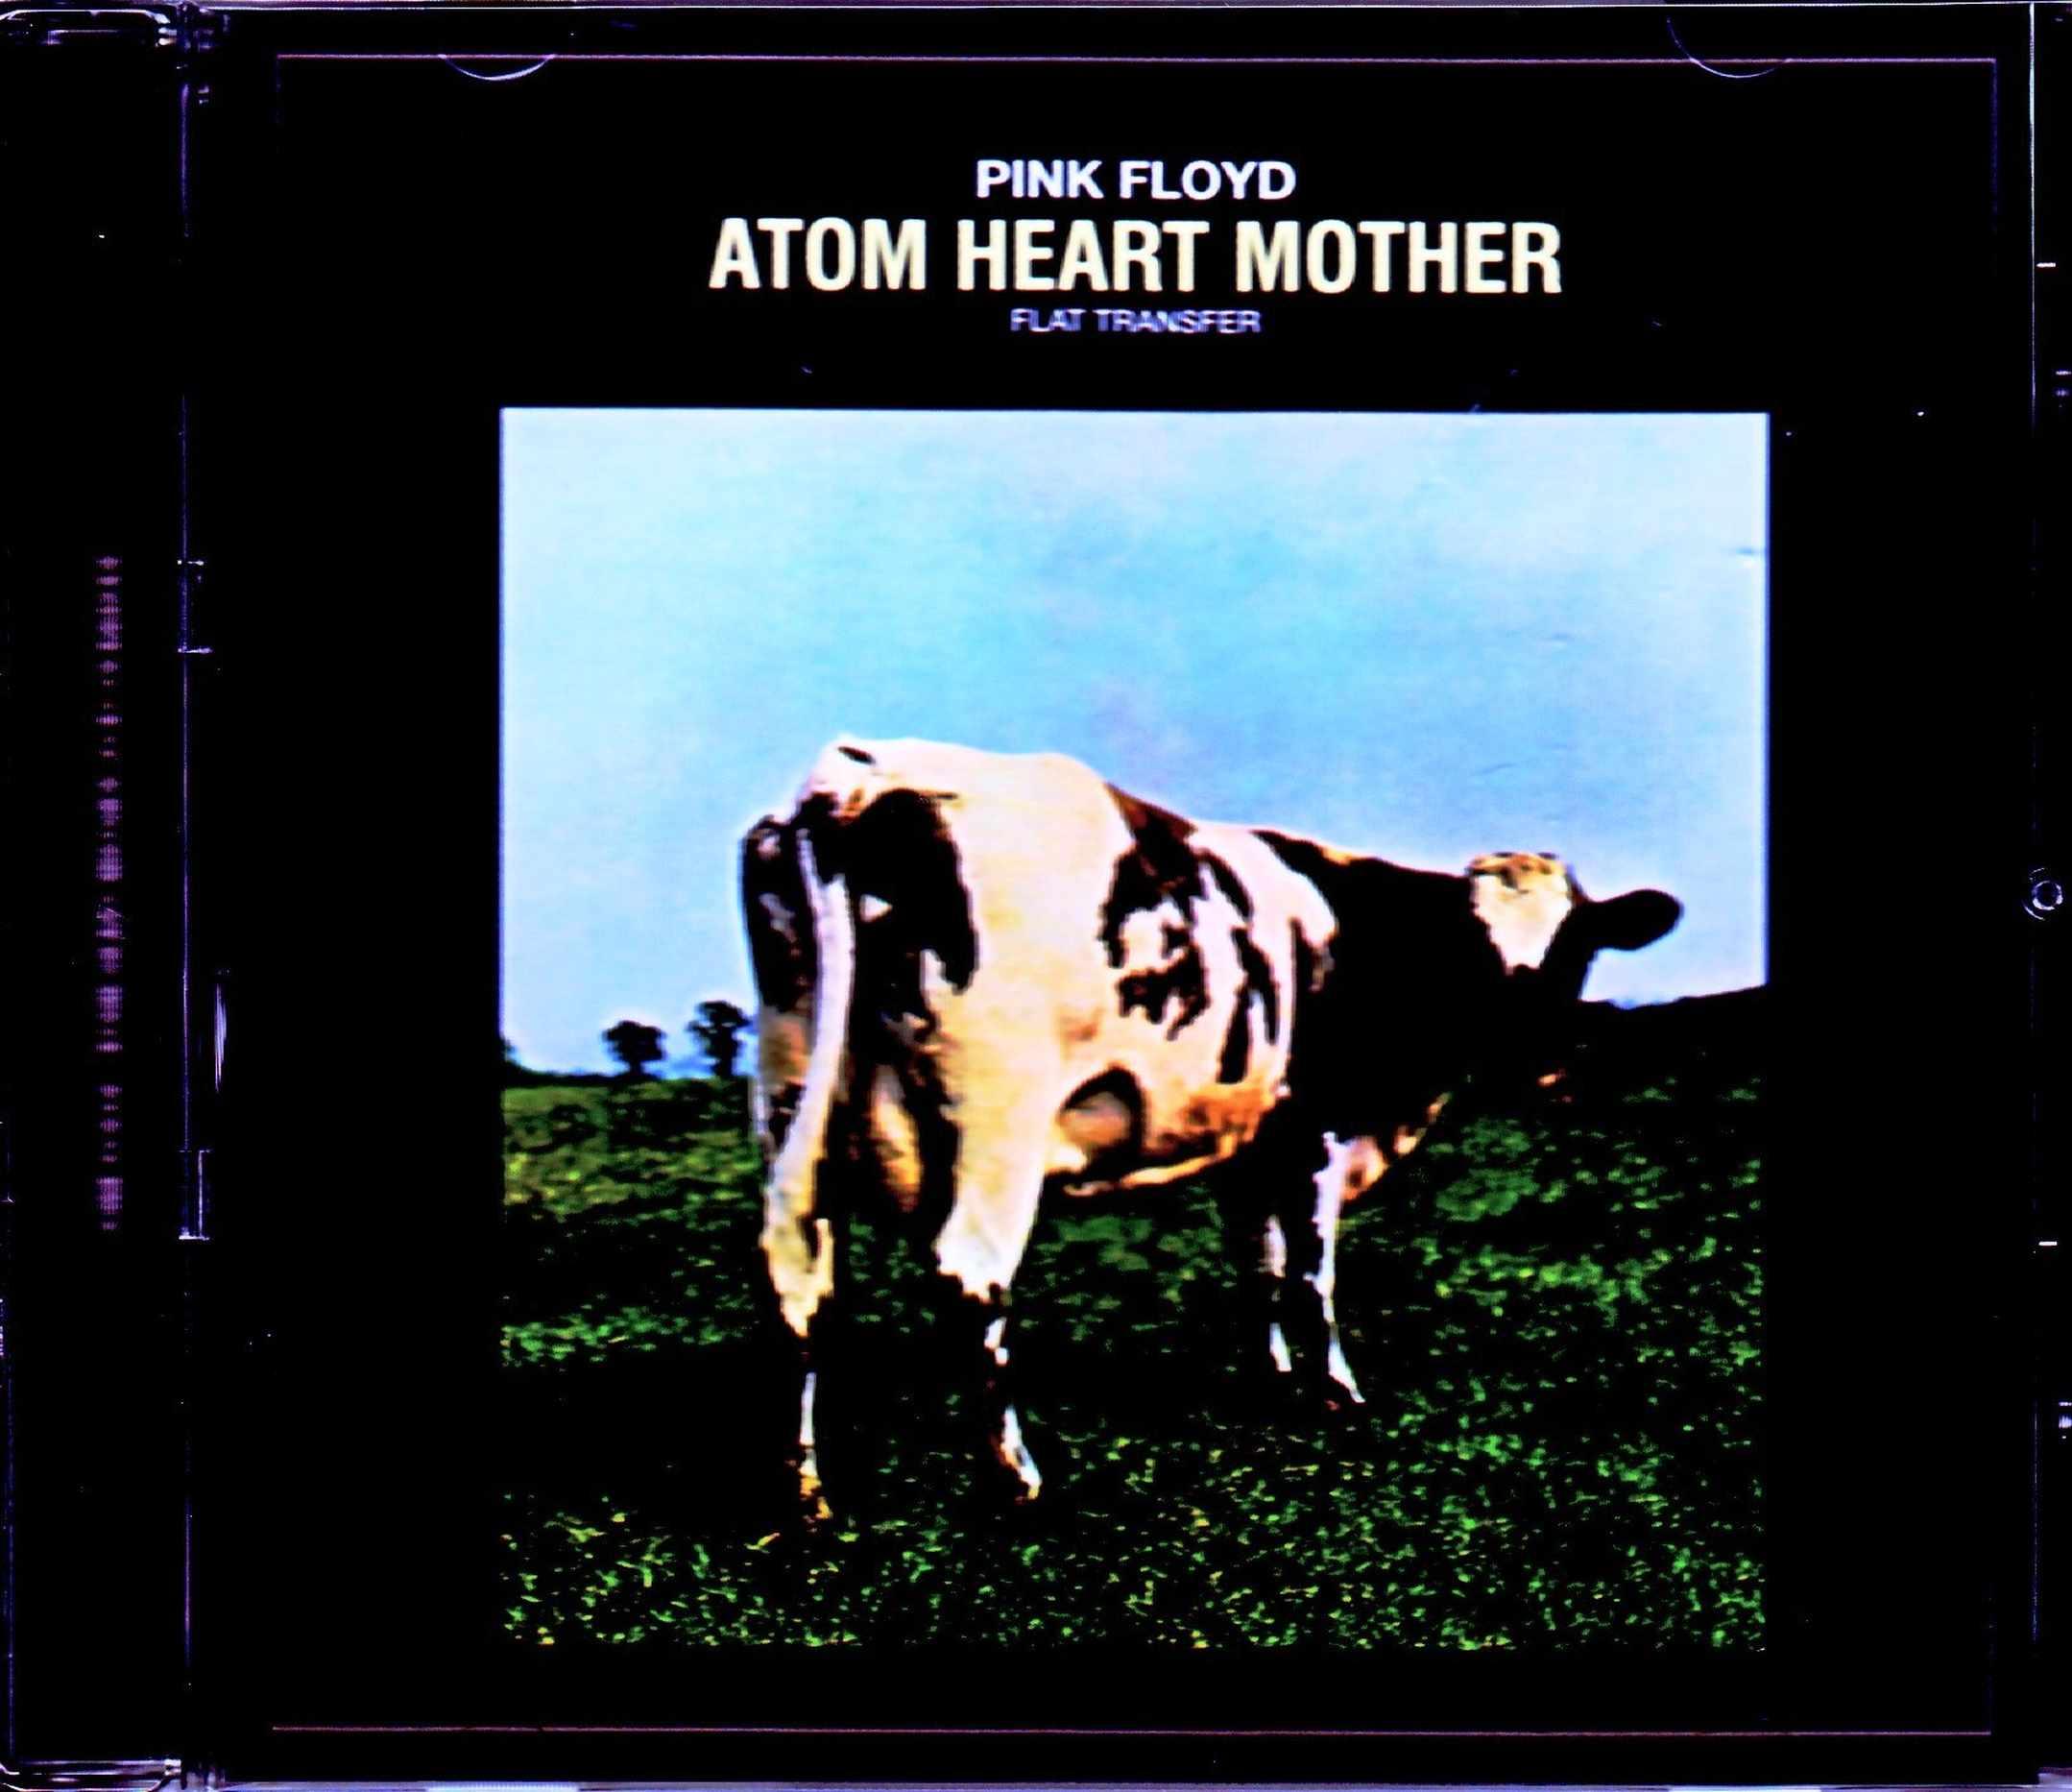 Pink Floyd ピンク・フロイド/原子心母 Atom Heart Mother Flat Transfer